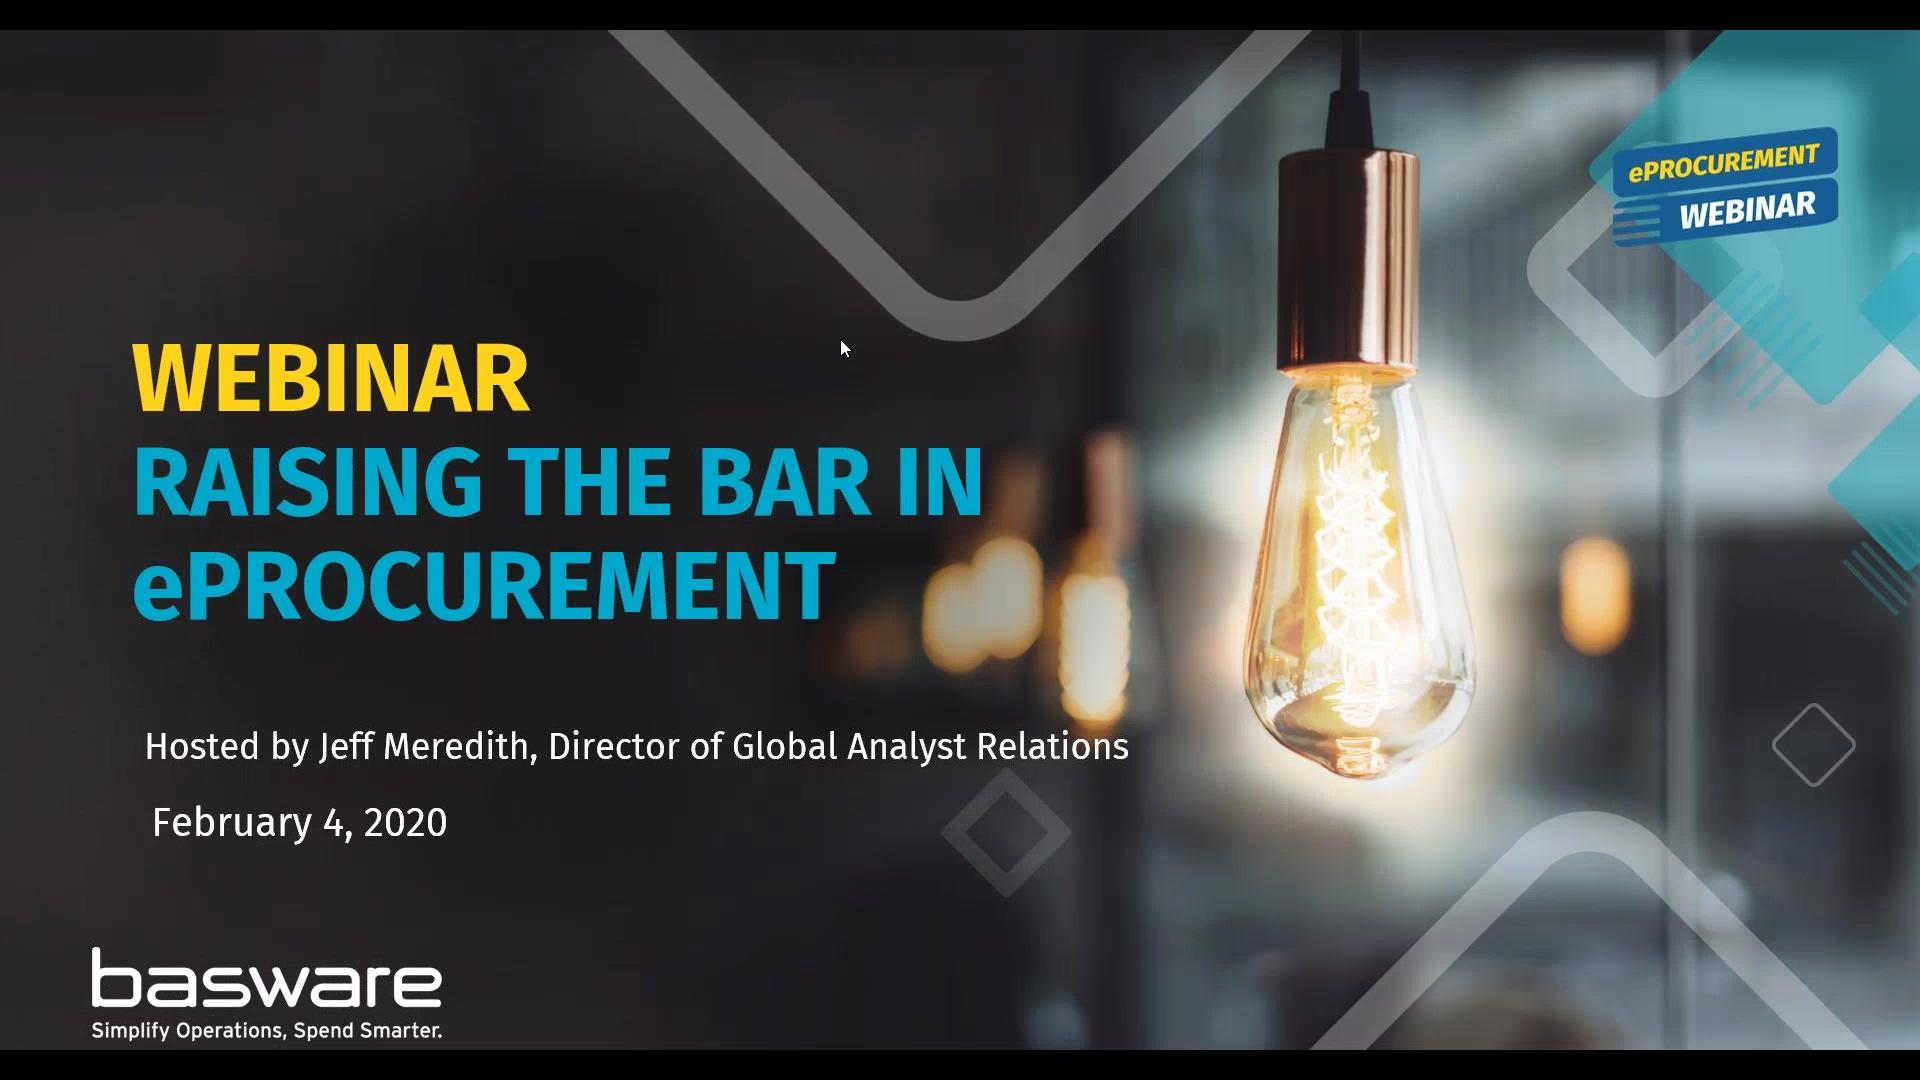 Digital_Connect_On_Demand-Raising_the_Bar_in_eProcurement